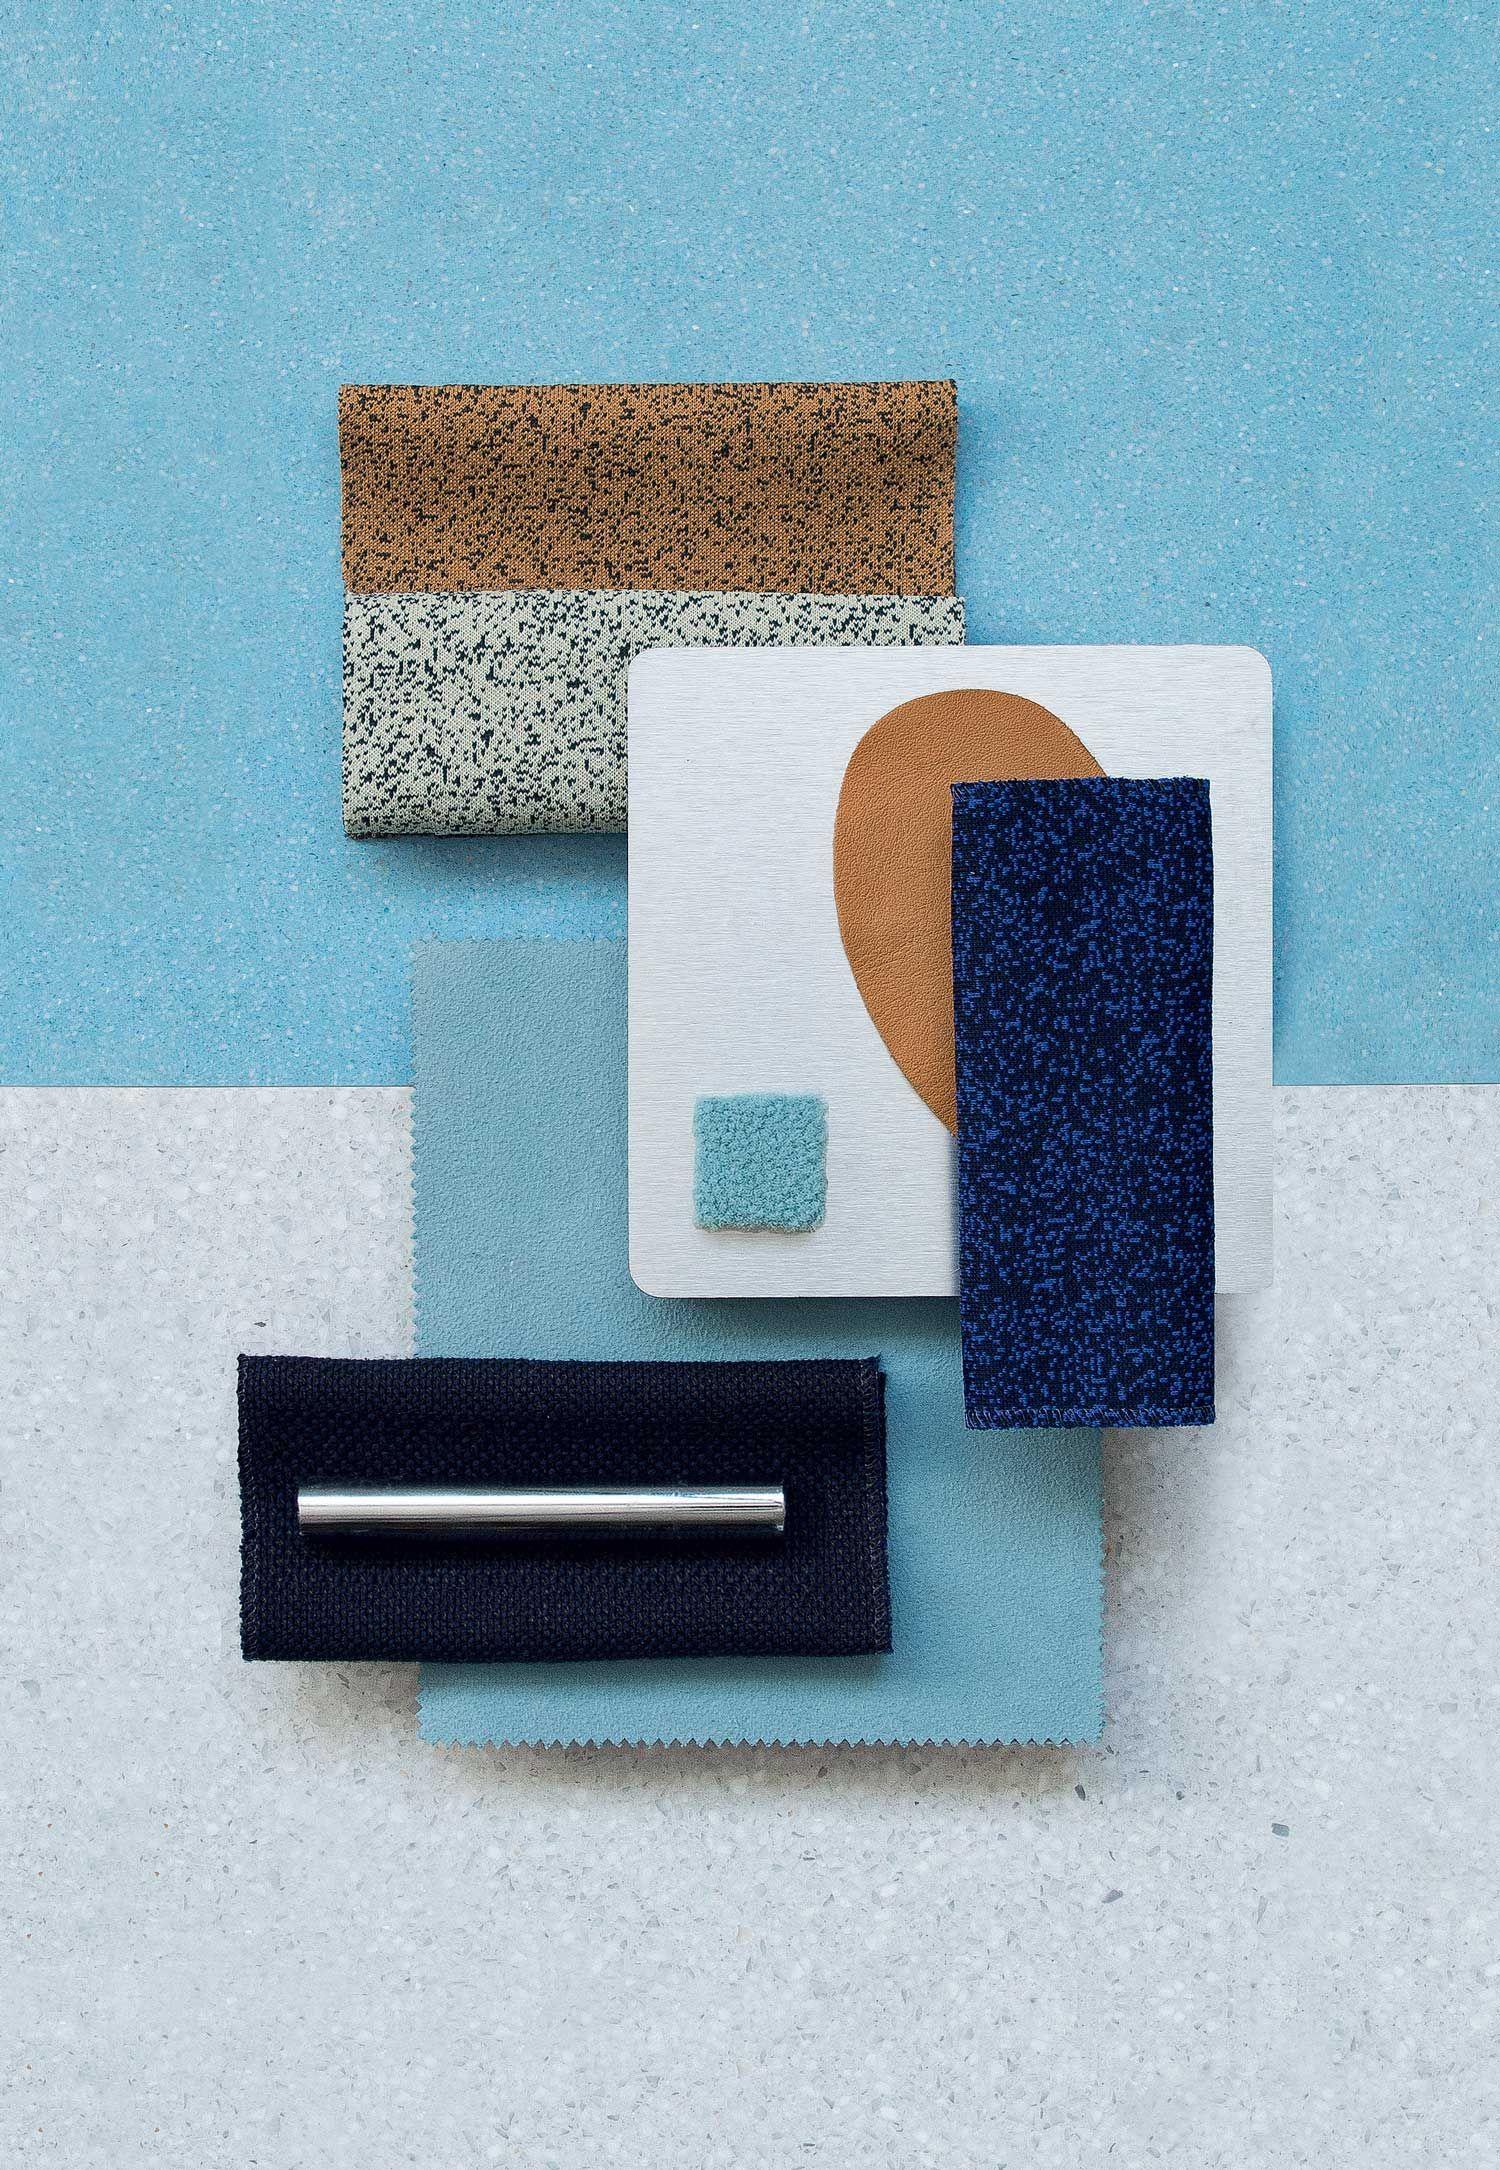 Poliform Lab Debuts Four Conceptual Installations By David